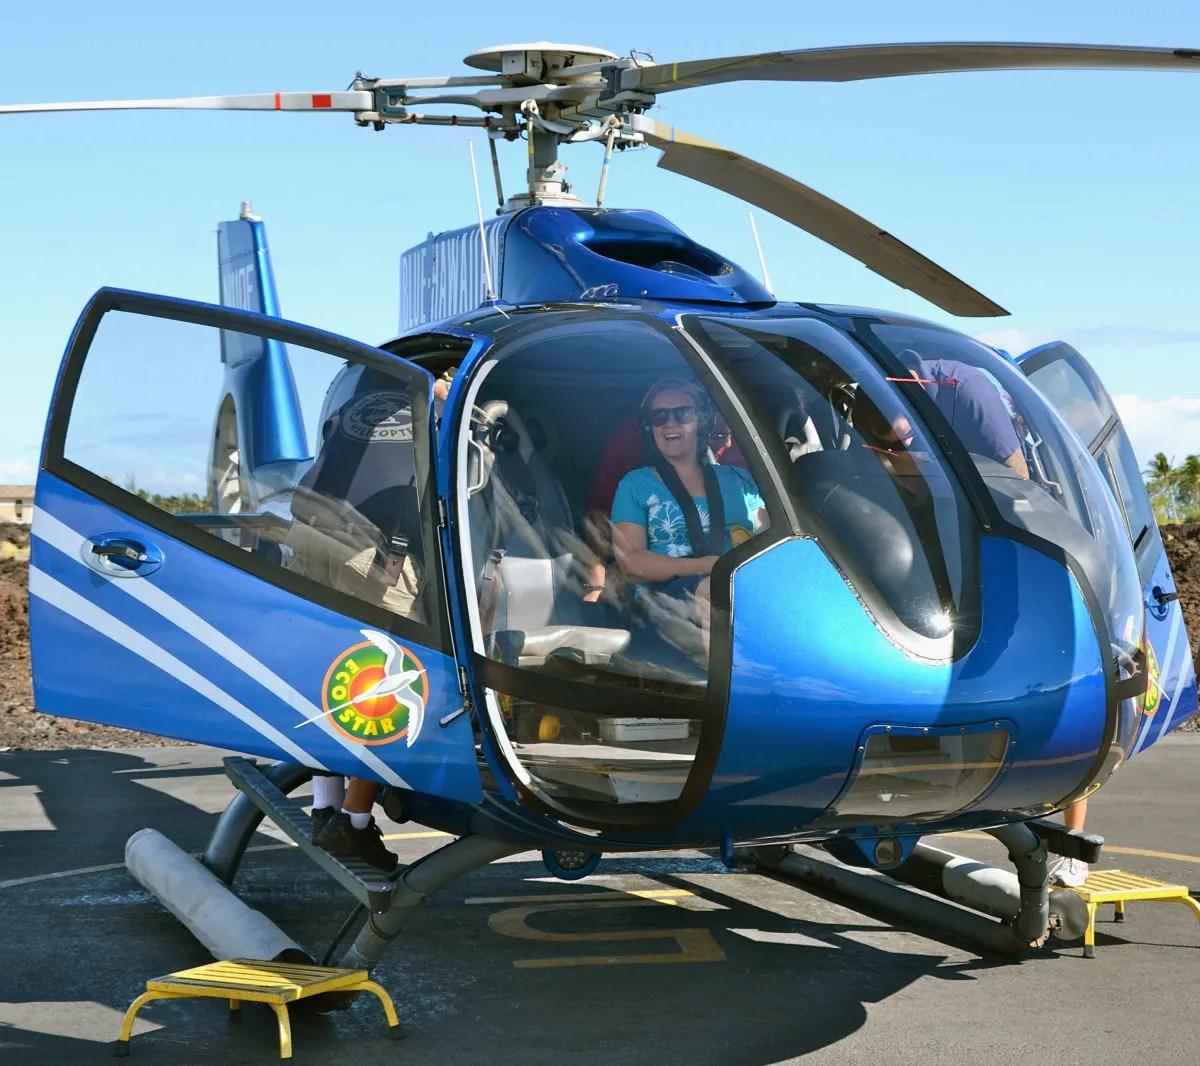 Hawaii Big Island with Kids - Blue Hawaiian Helicopter Tour